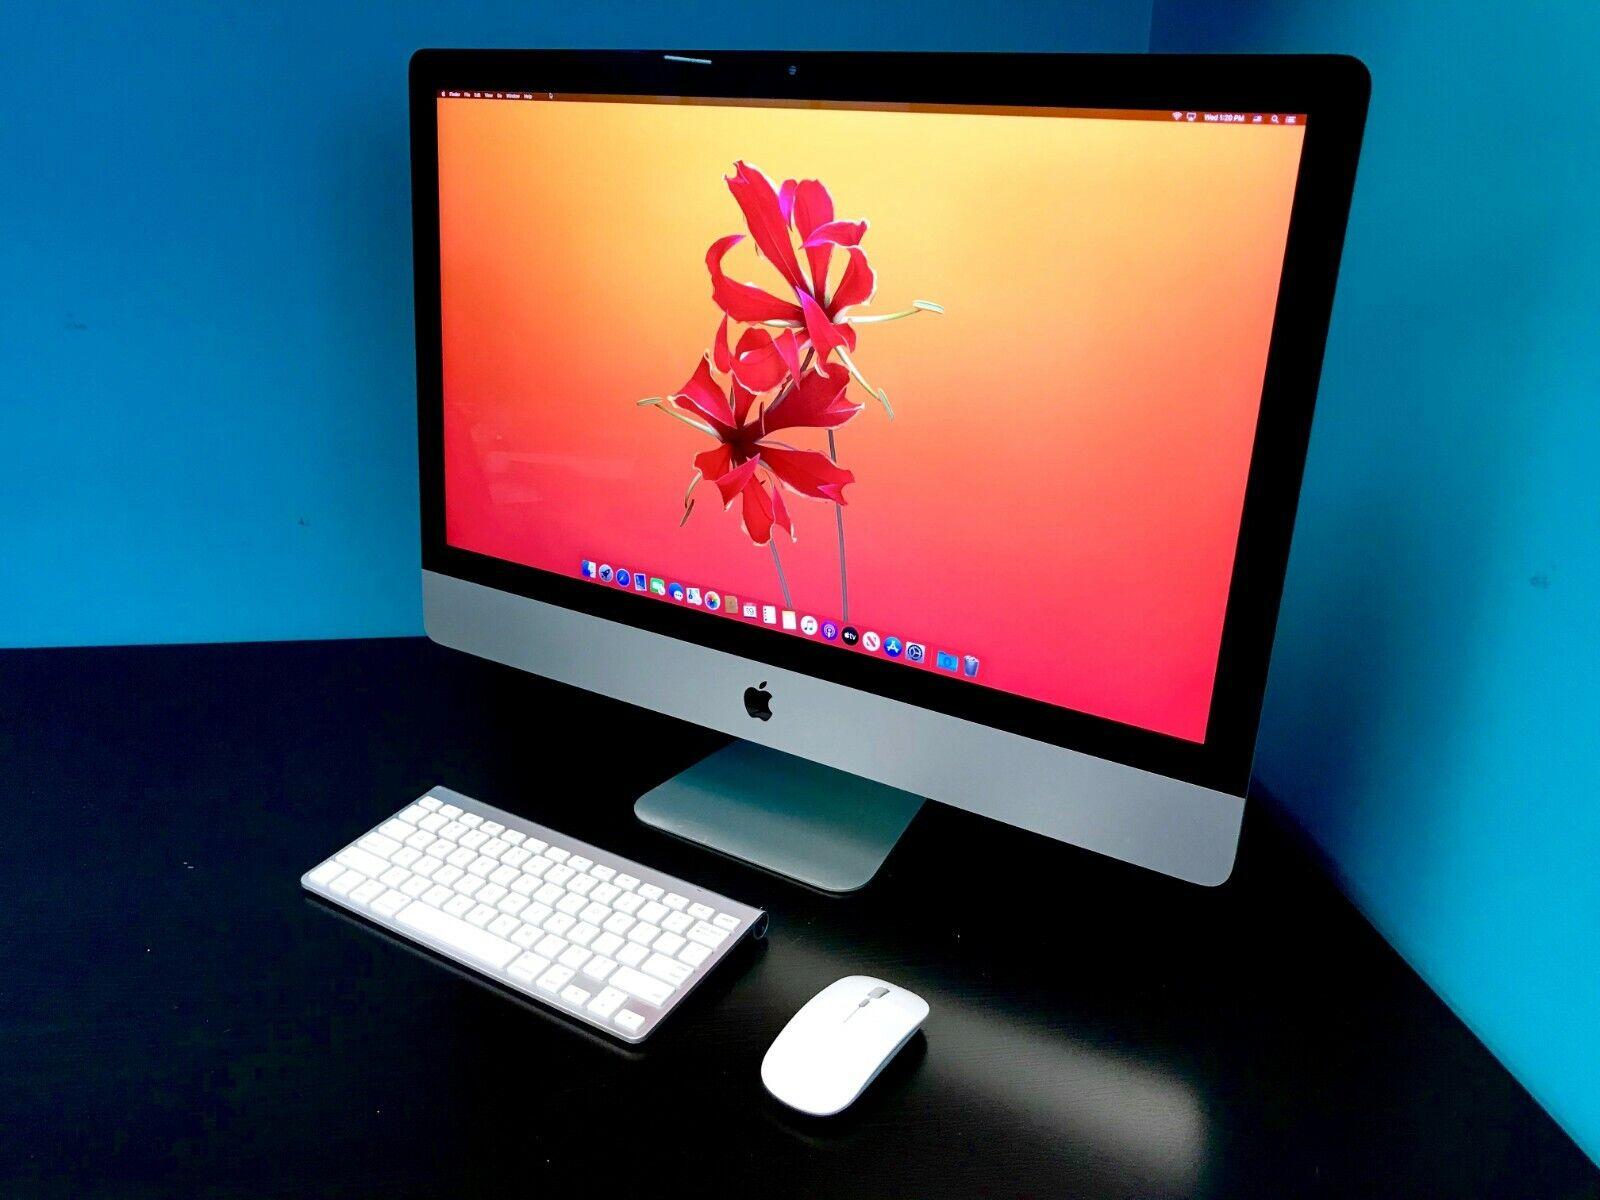 Apple iMac 27 SLIM Display | i7 QUAD | 1TB SSD 16GB |All-in-One Desktop Warranty. Buy it now for 1099.00